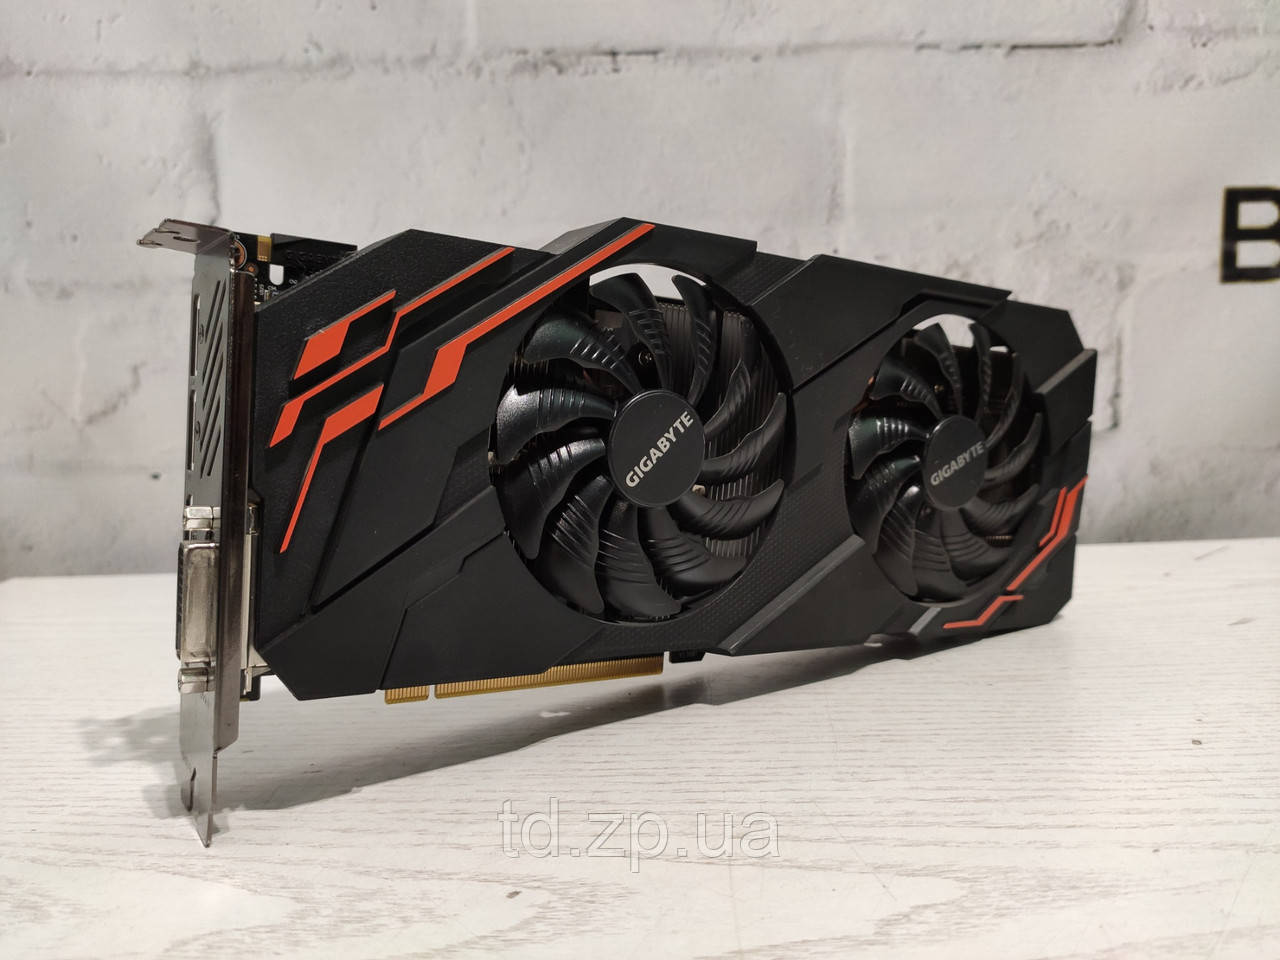 Видеокарта Gigabyte GeForce GTX 1070 8Gb